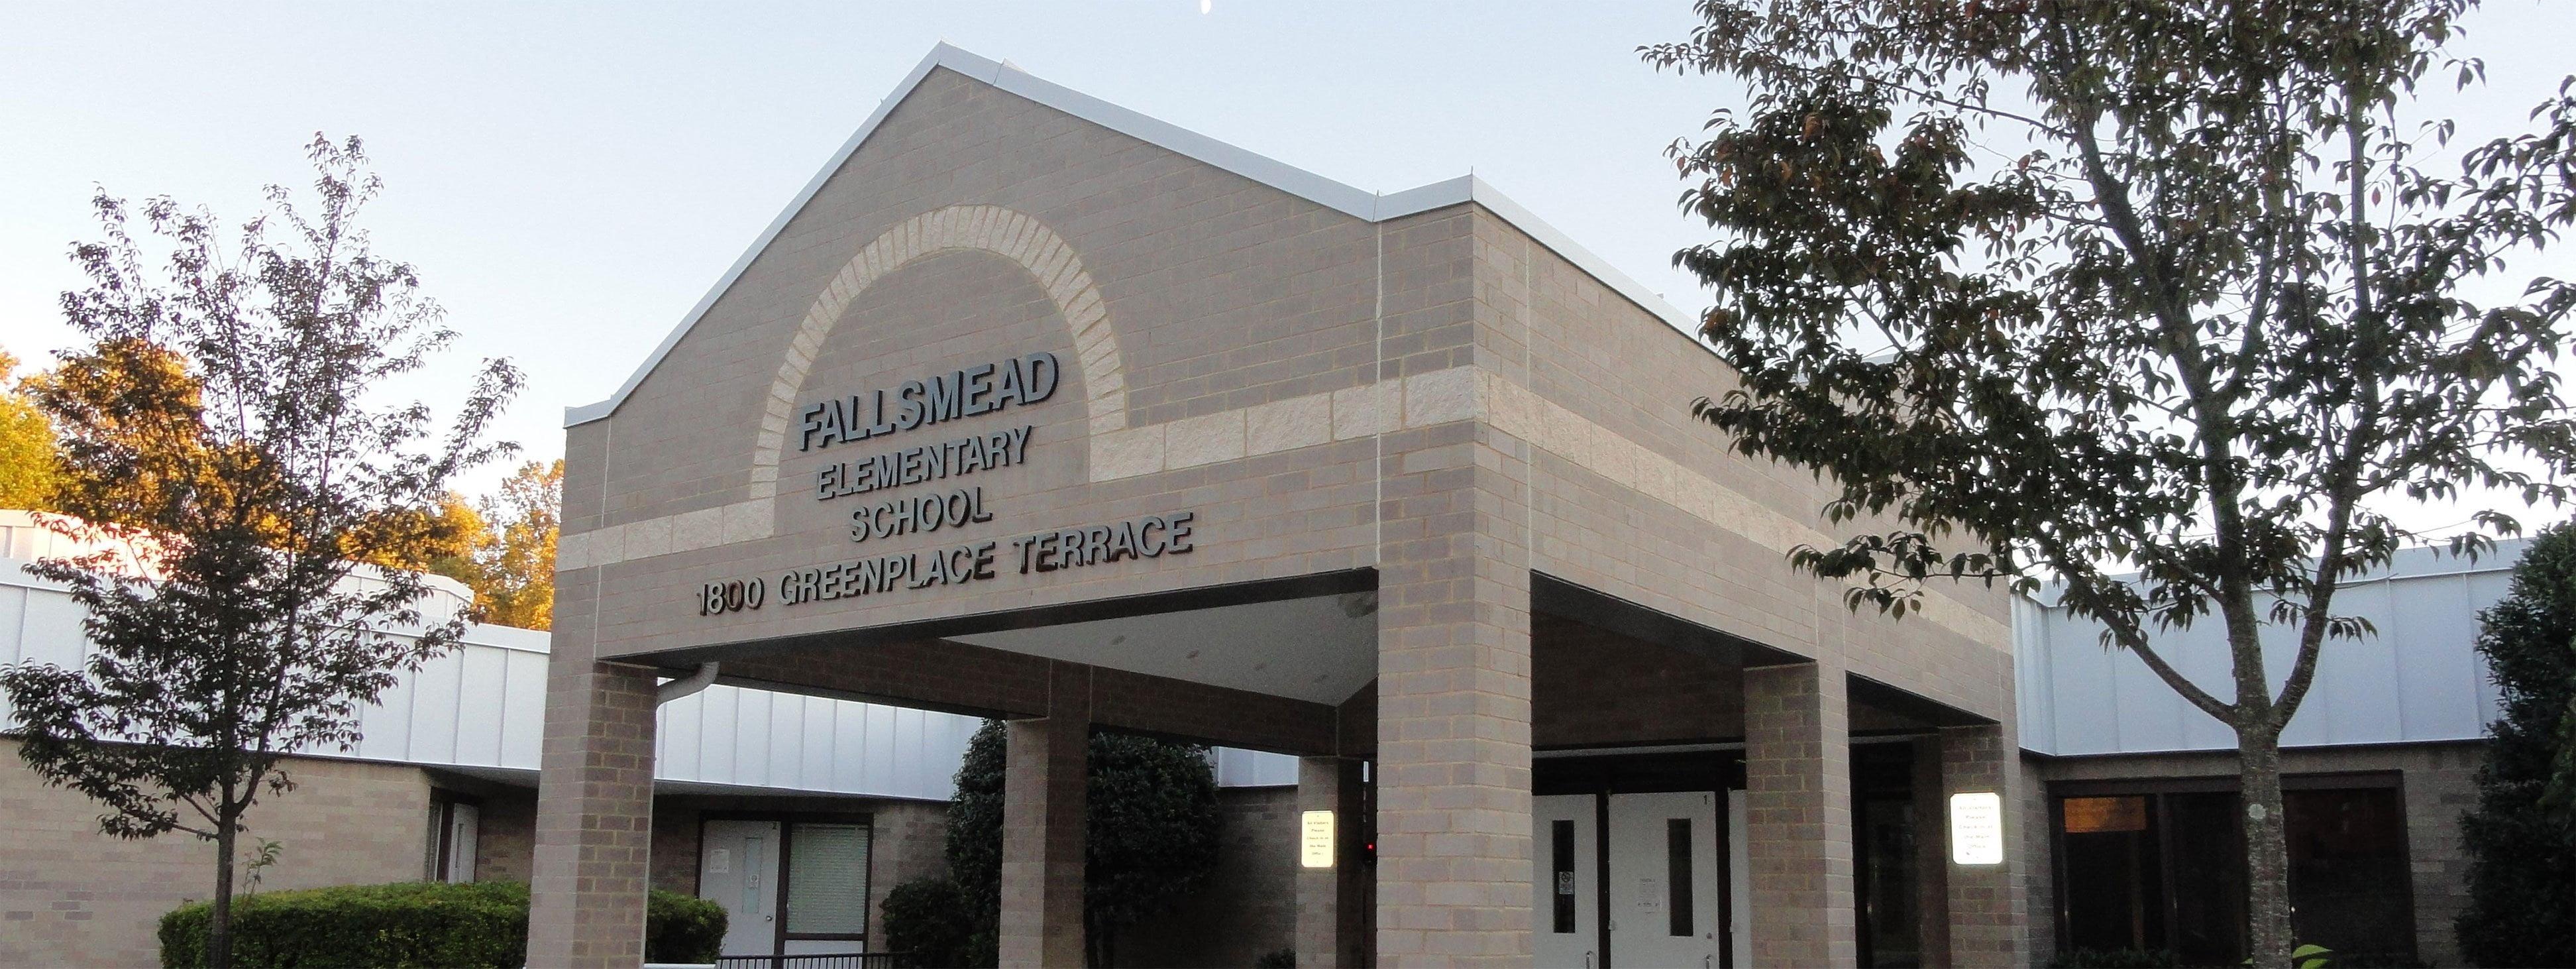 Fallsmead-Elementary-School